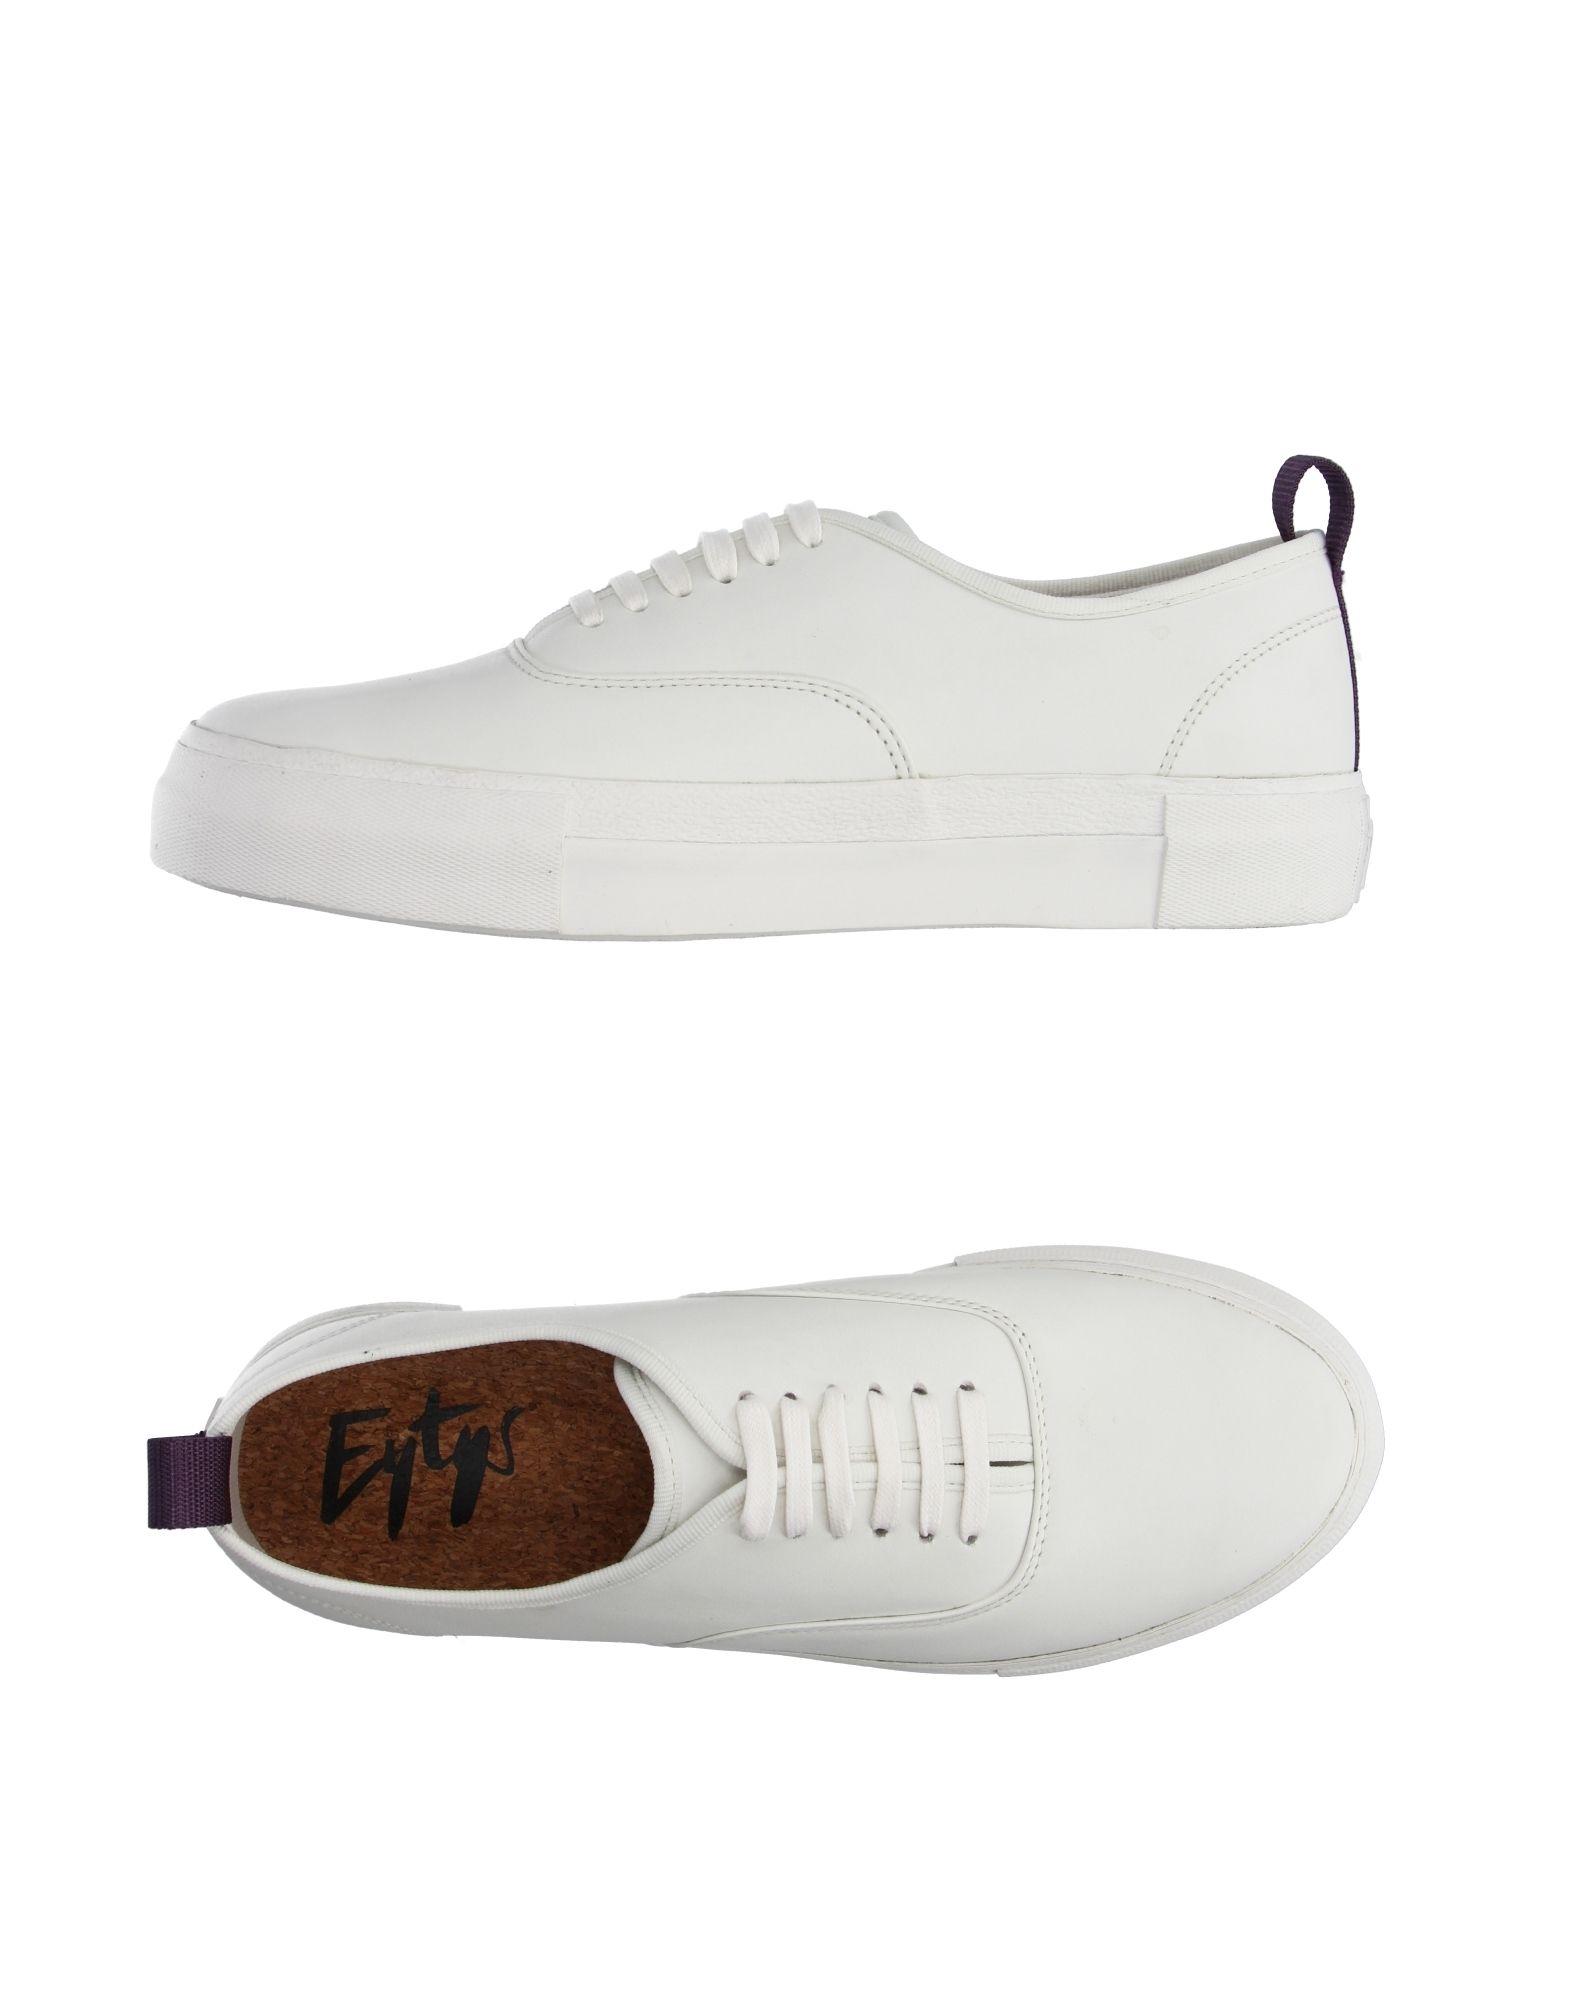 Eytys Heiße Sneakers Herren  11032090HD Heiße Eytys Schuhe 031e37